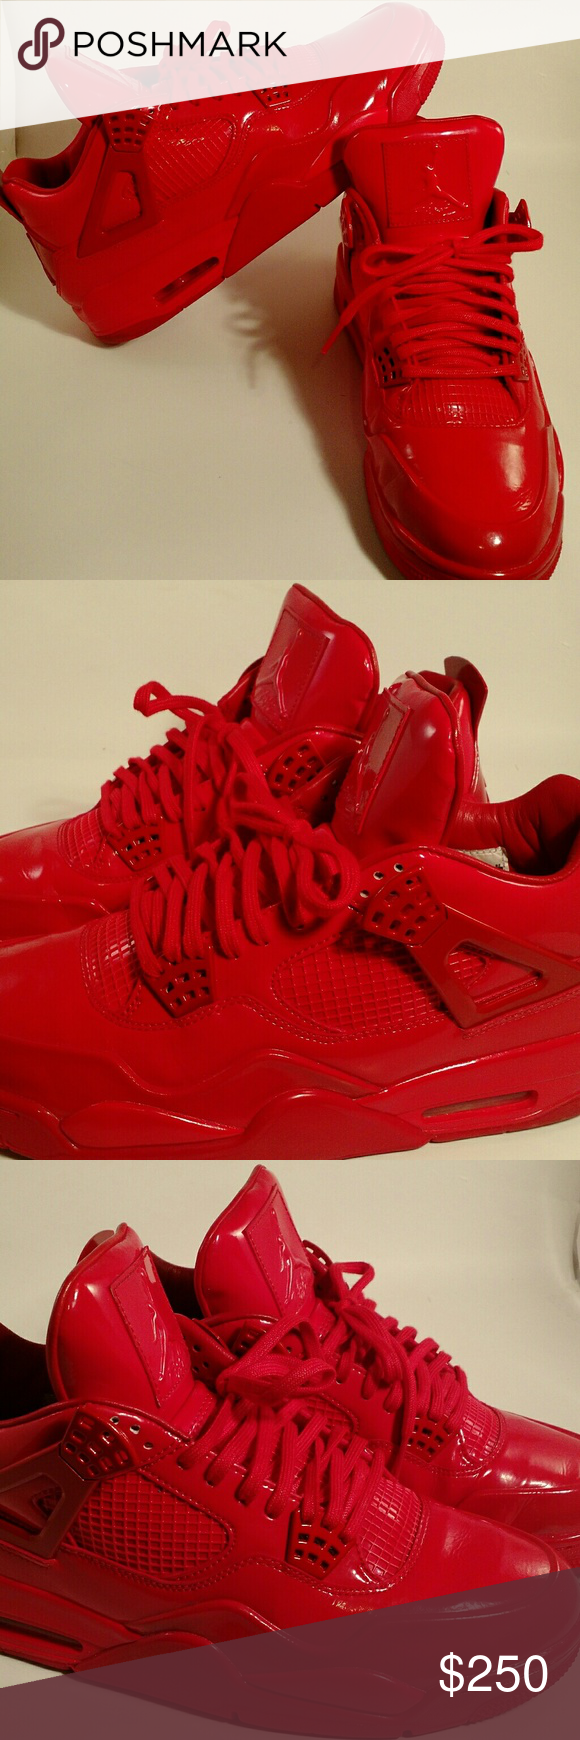 low priced 6e675 cb286 Nike Jordan 11LAB4 -Men s Patent Leather Nike Jordan 11LAB4 -Men s Patent  Leather University Red